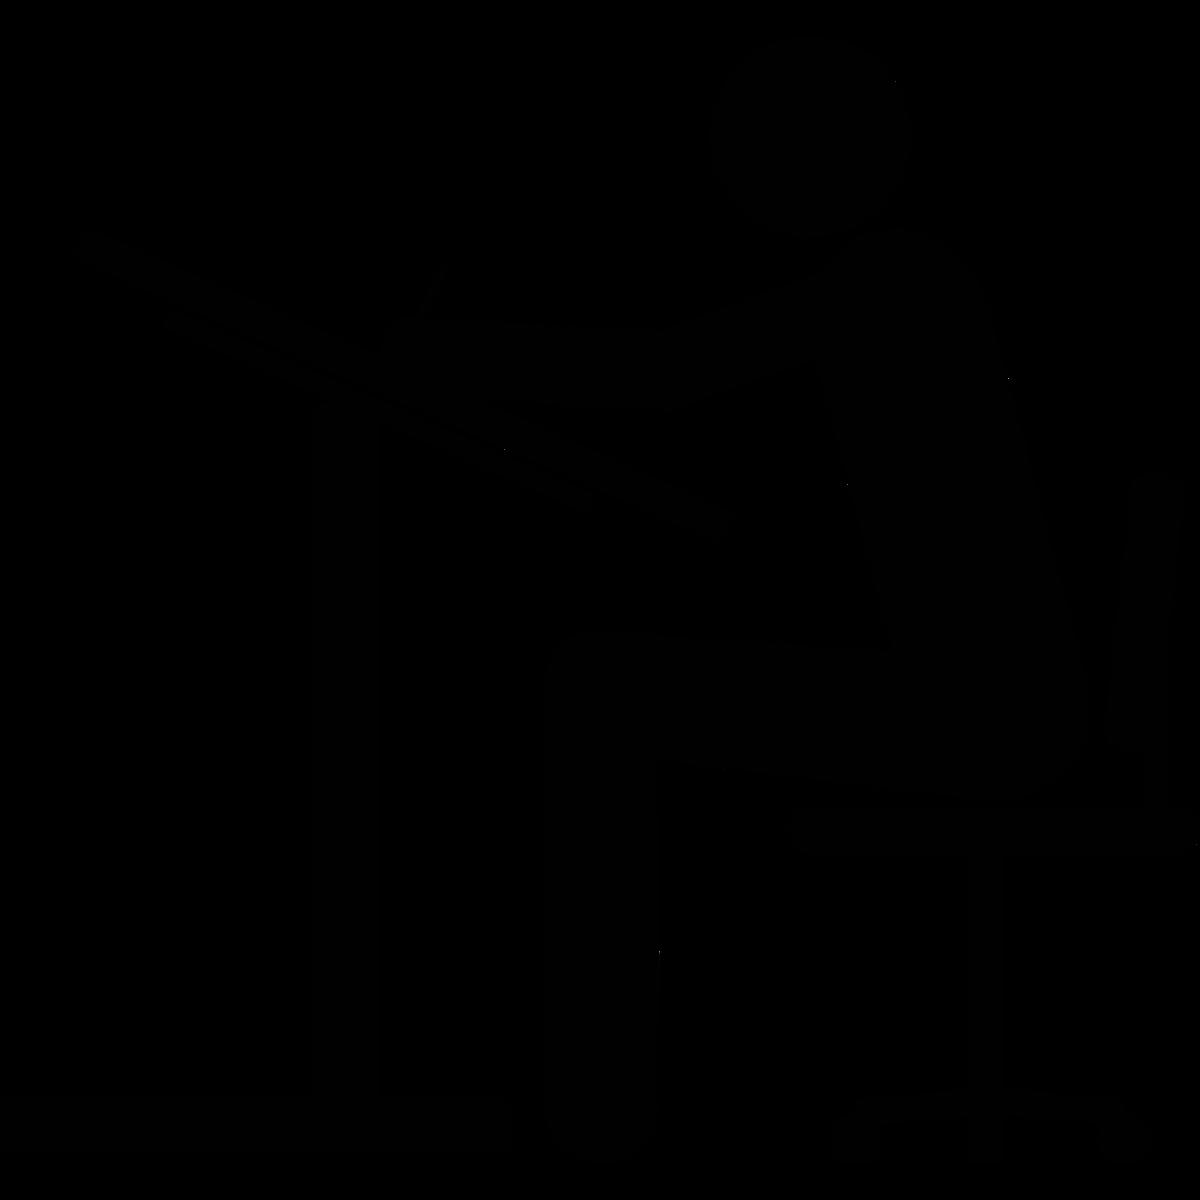 kisspng-architecture-computer-icons-architect-5abe43ba9f2d96.184655031522418618652